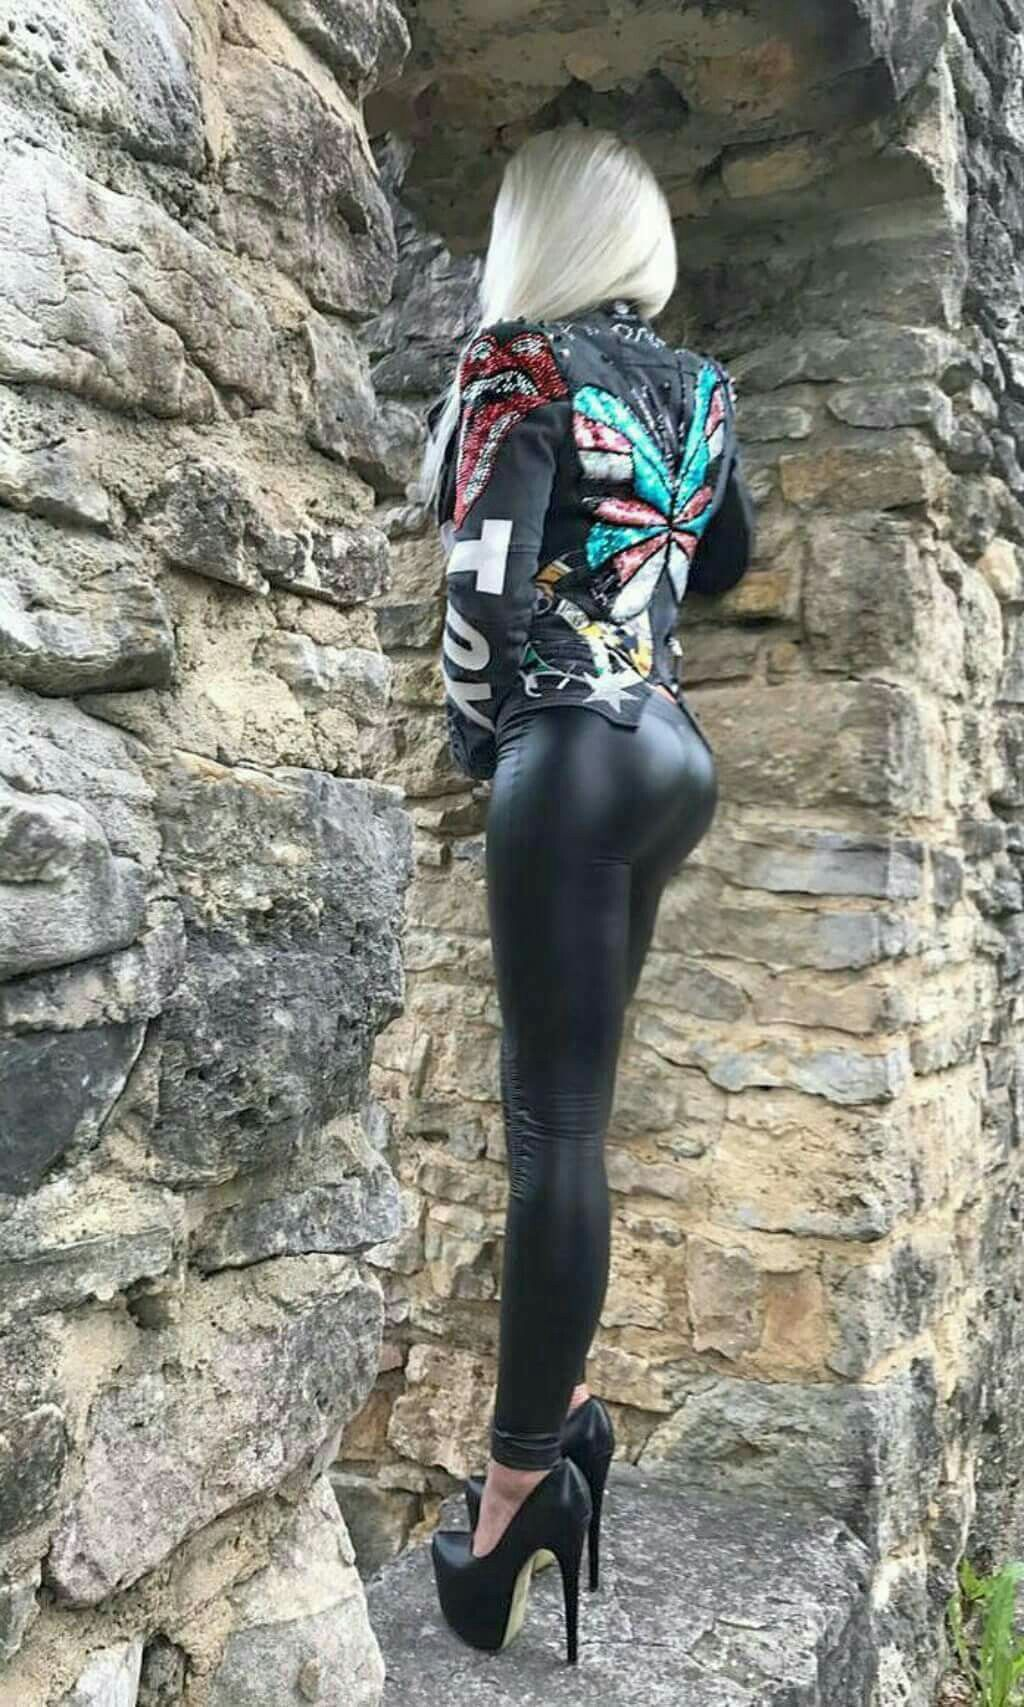 Knackarsch in leggings